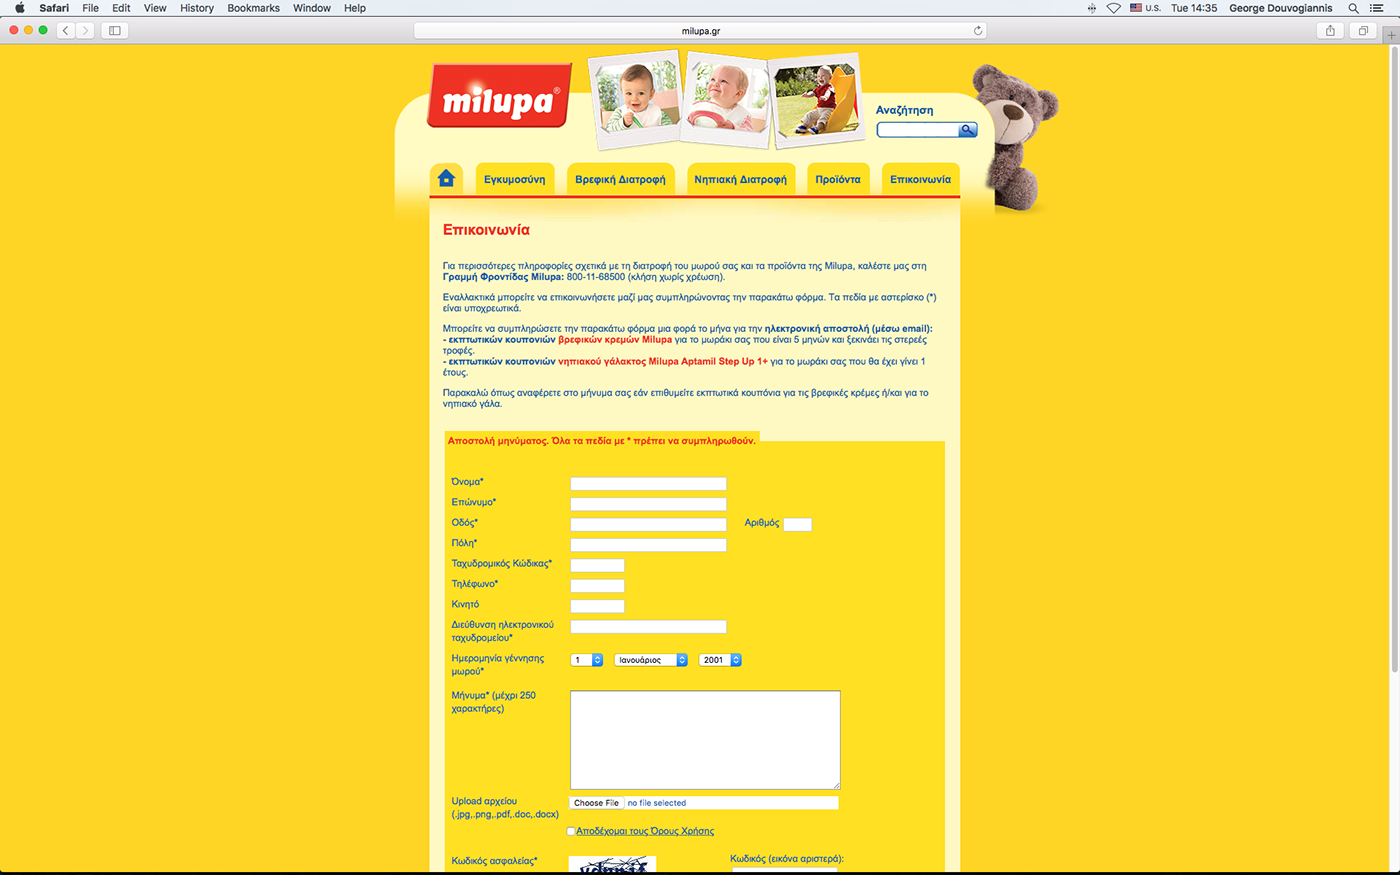 joomla,custom template,development,css,HTML,JavaScript